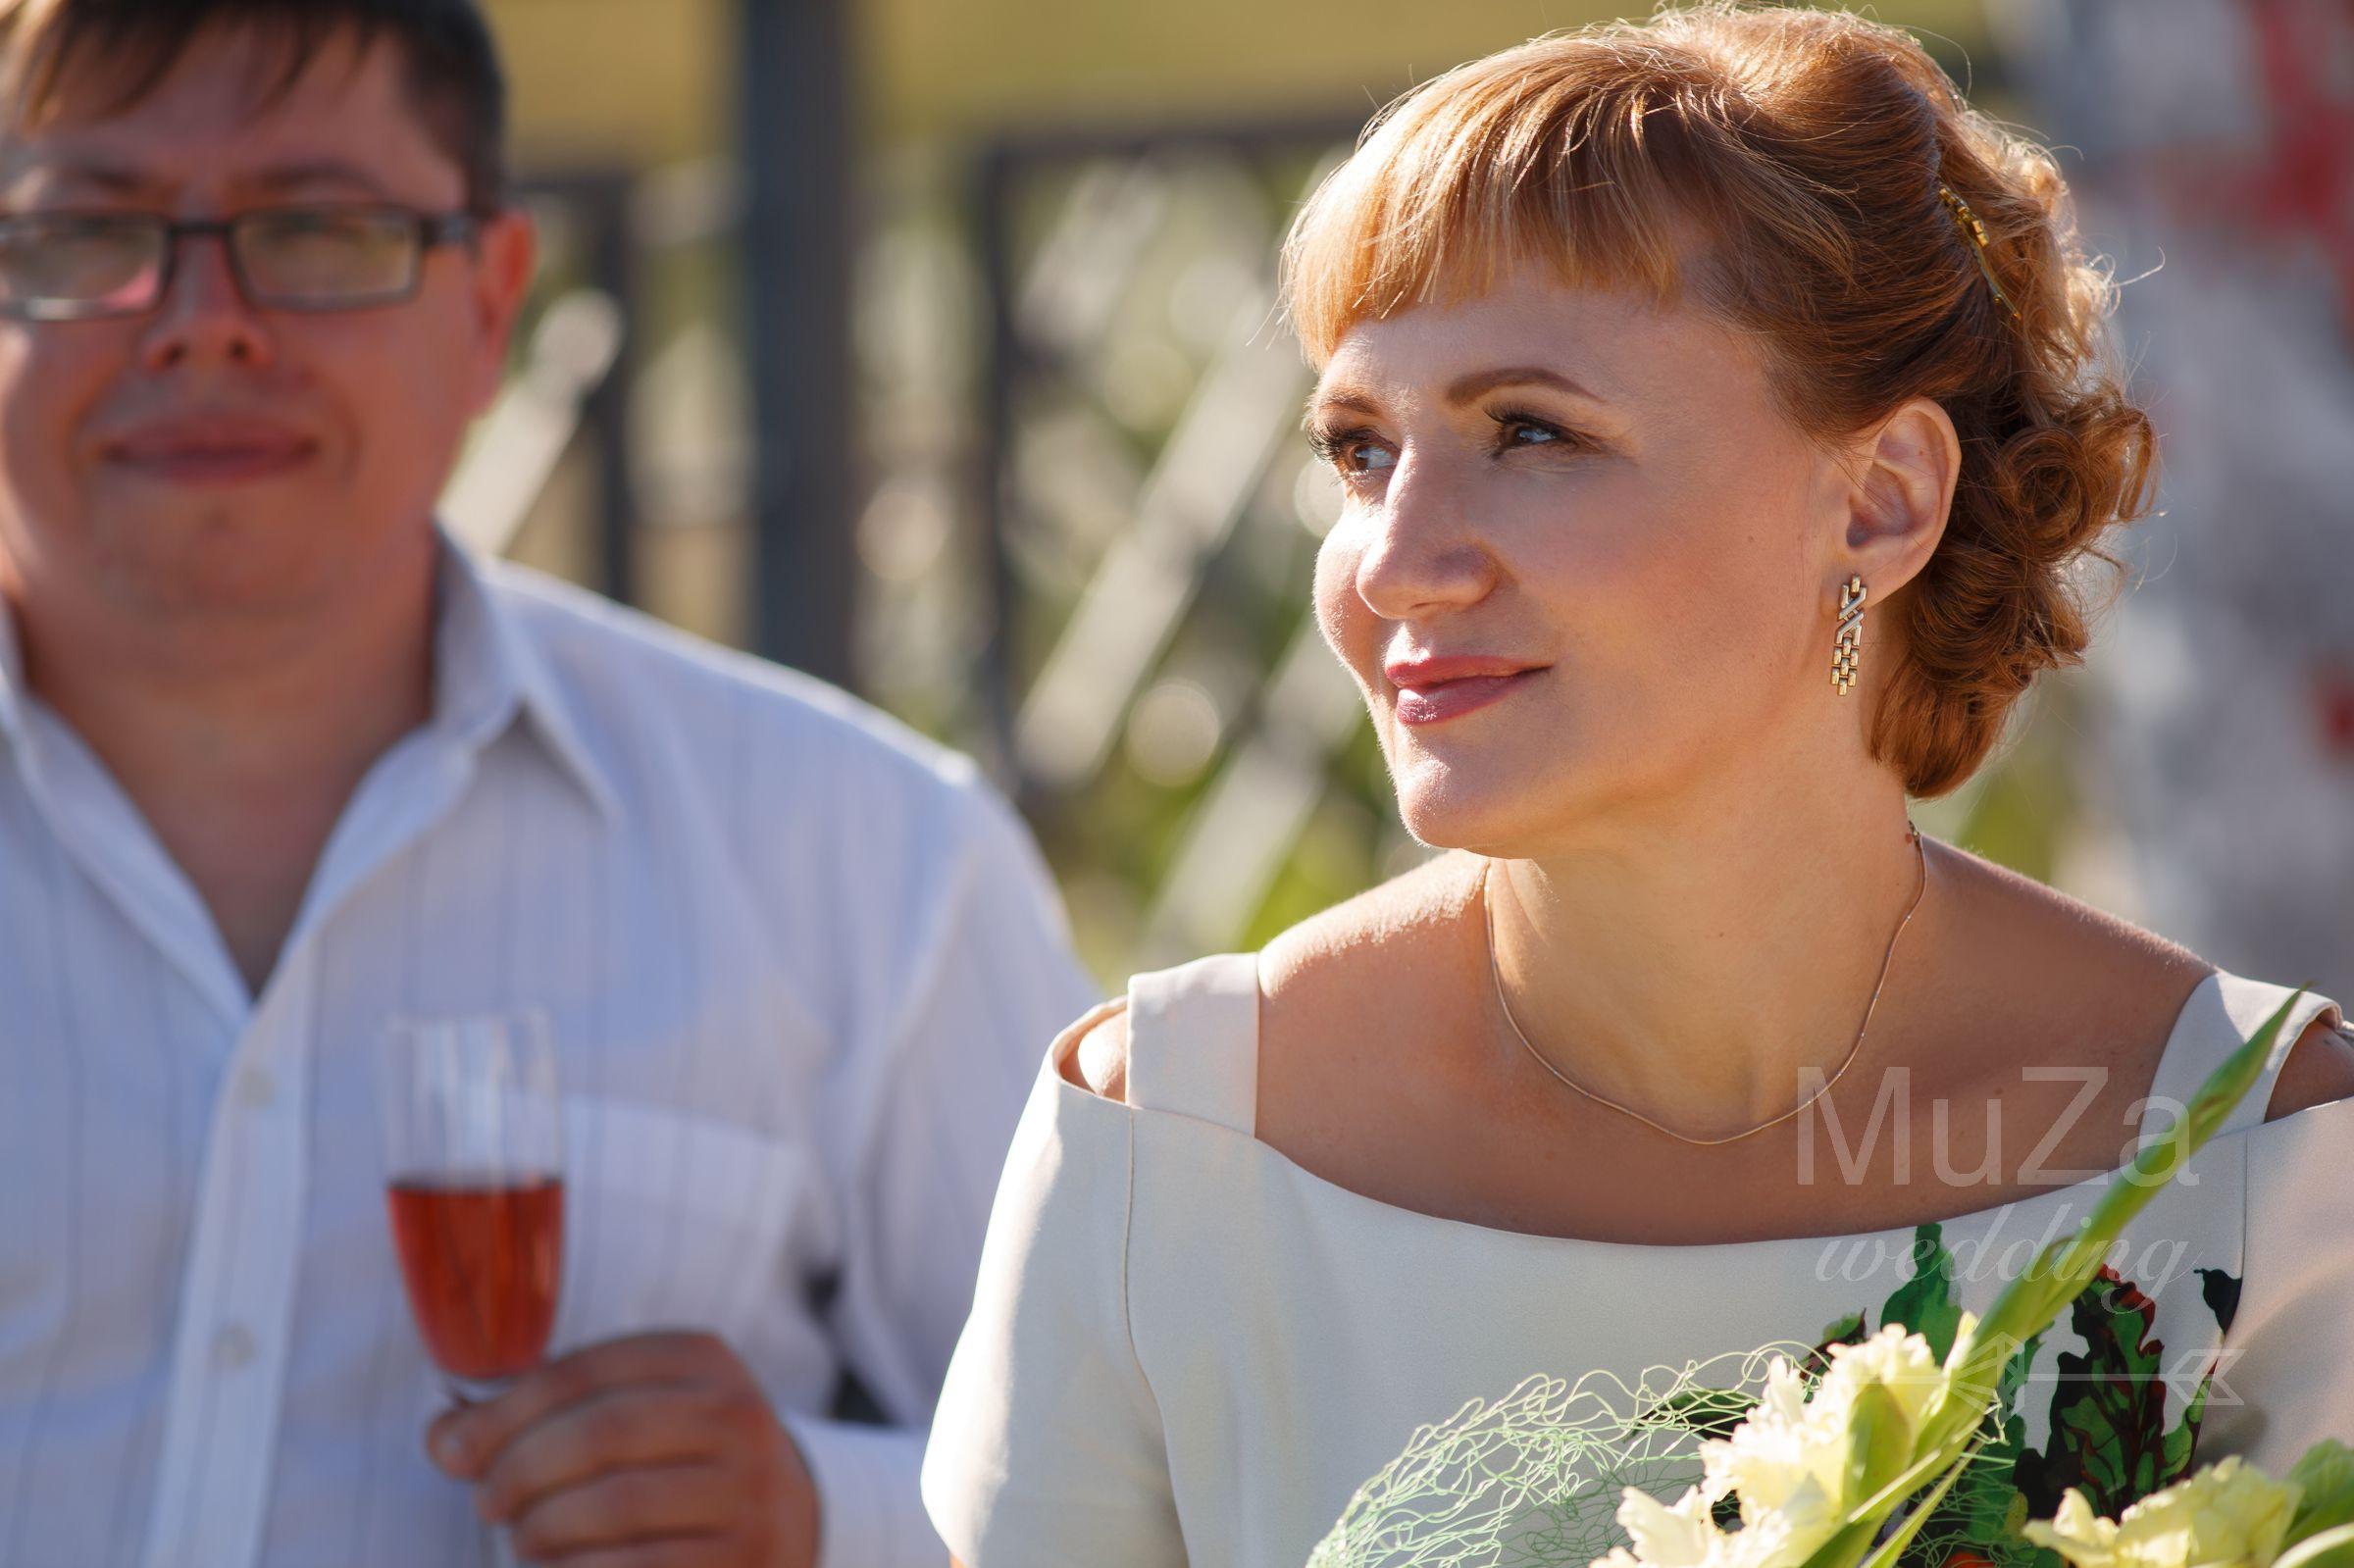 гости на свадьбе ожидают молодоженов